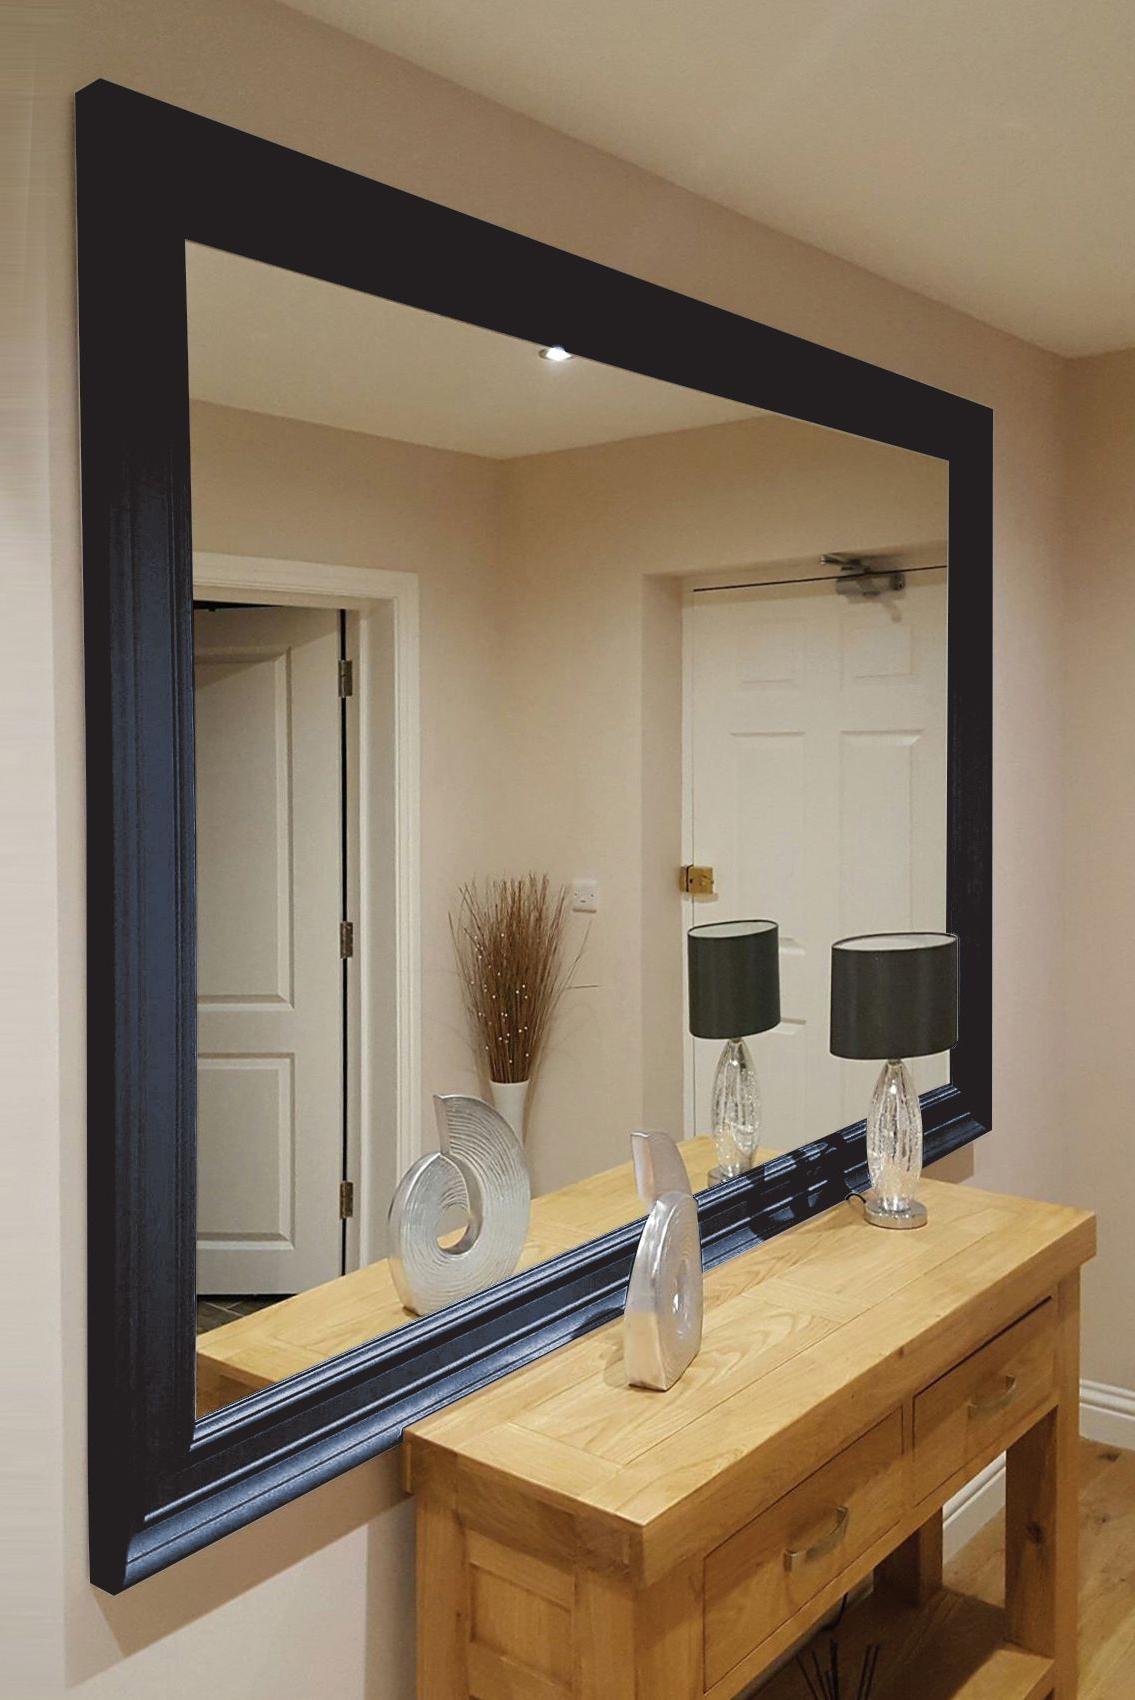 Latest Large Modern Oxford Black Wall Mirror 206x145cm In 2019 With Large Black Wall Mirrors (View 3 of 20)